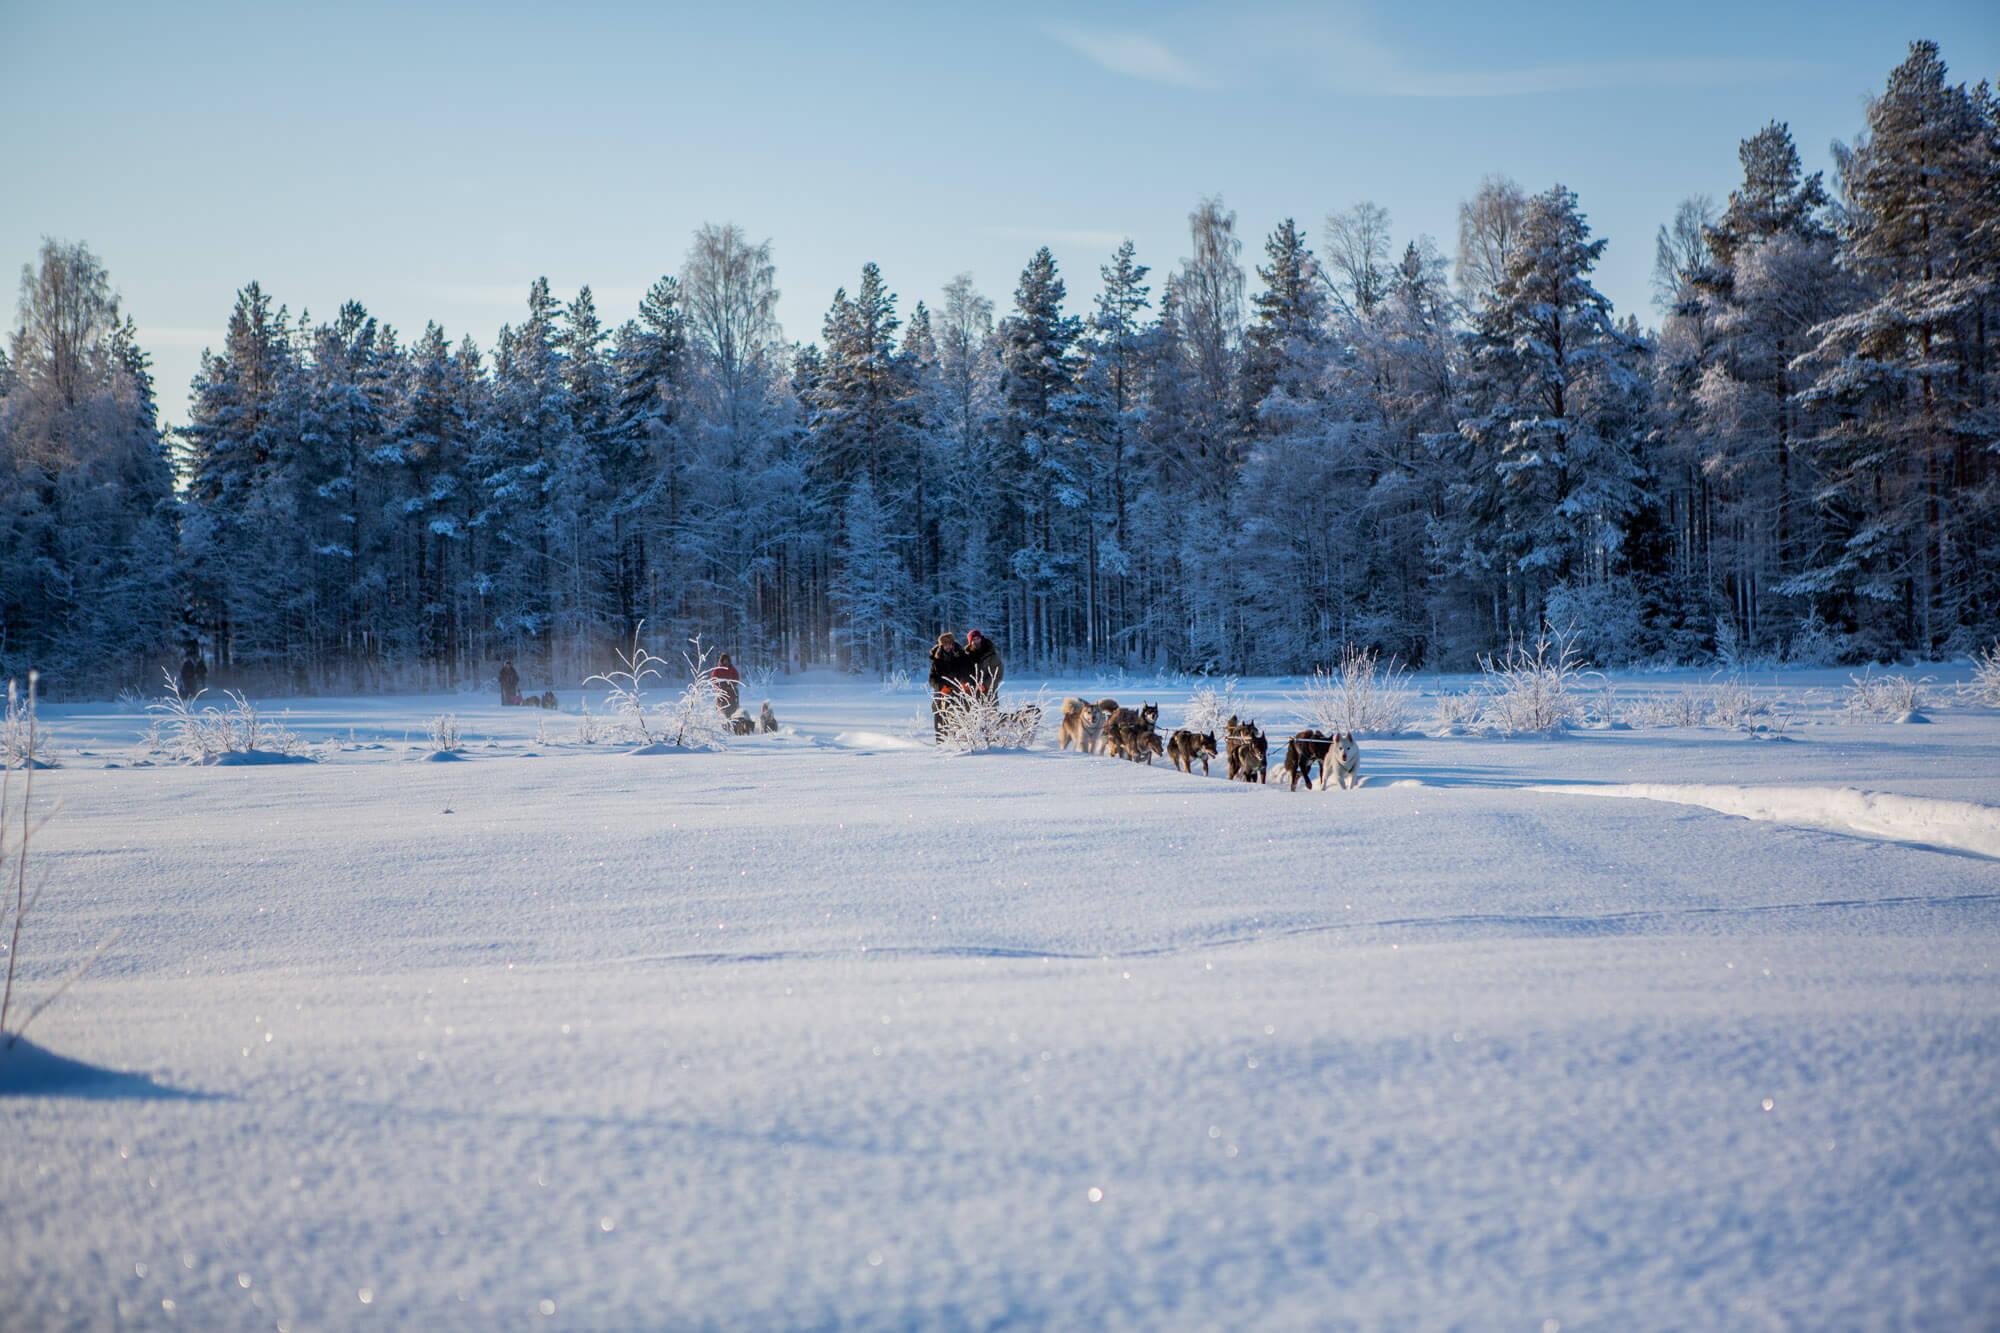 Dog sledding teams in Swedish Lapland